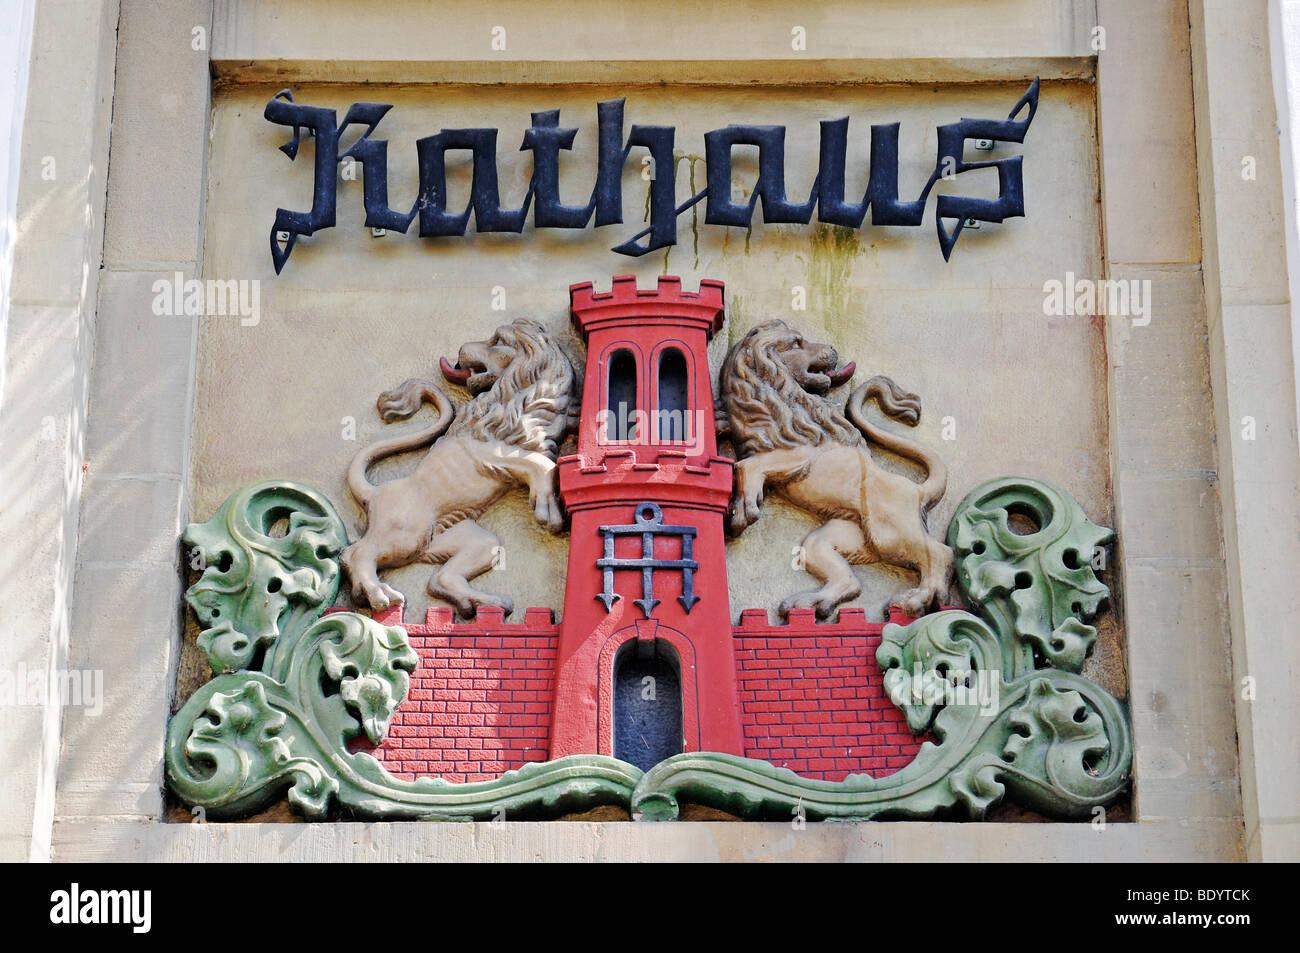 Coat of arms, town hall, historic centre, Warendorf, Muensterland region, North Rhine-Westphalia, Germany, Europe - Stock Image